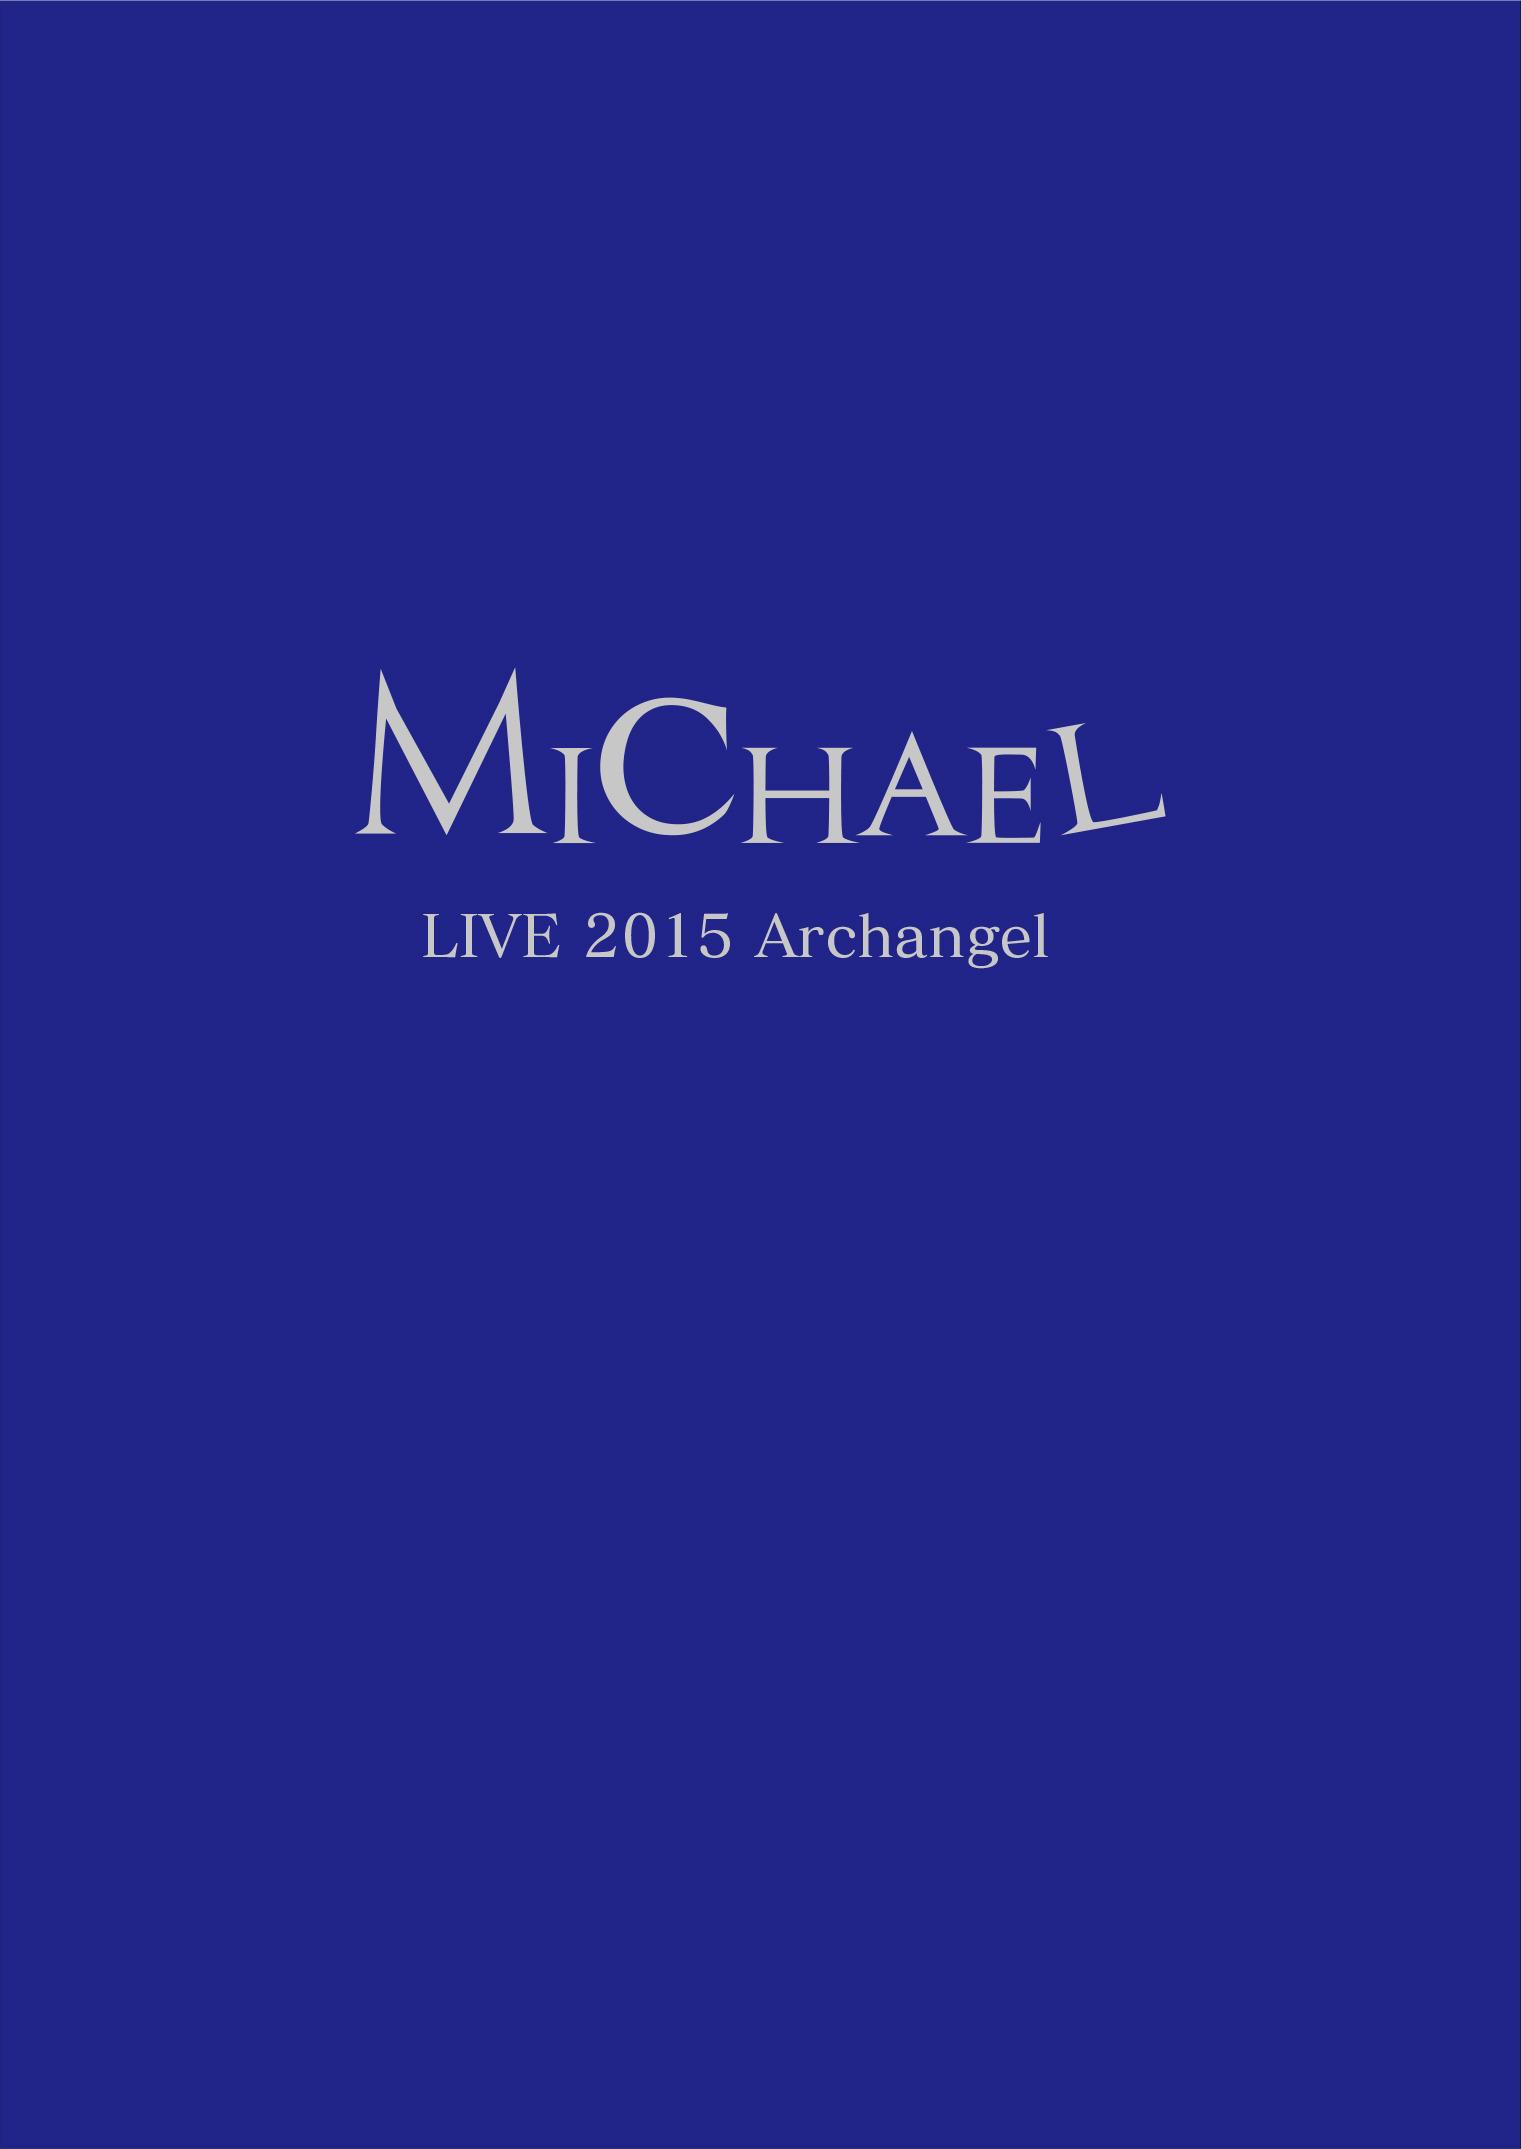 《7zoo7会員》LIVE DVD【MICHAEL LIVE 2015 Archangel】<FC限定版>★特典CD付★